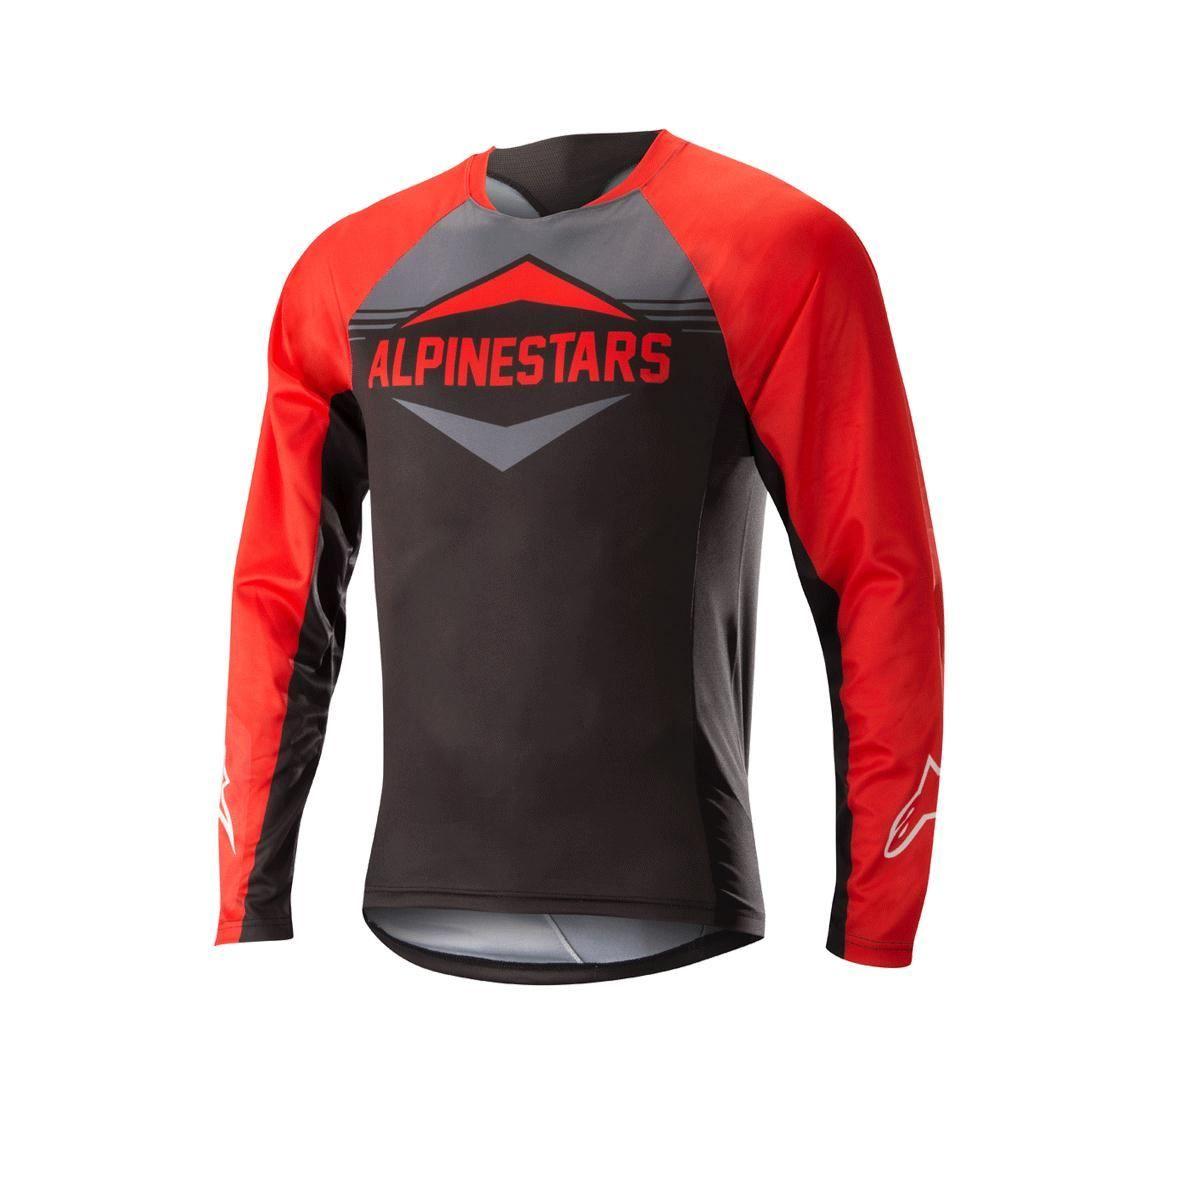 Alpinestars Mesa Long Sleeve Jersey 2018: Red/Steel Grey M